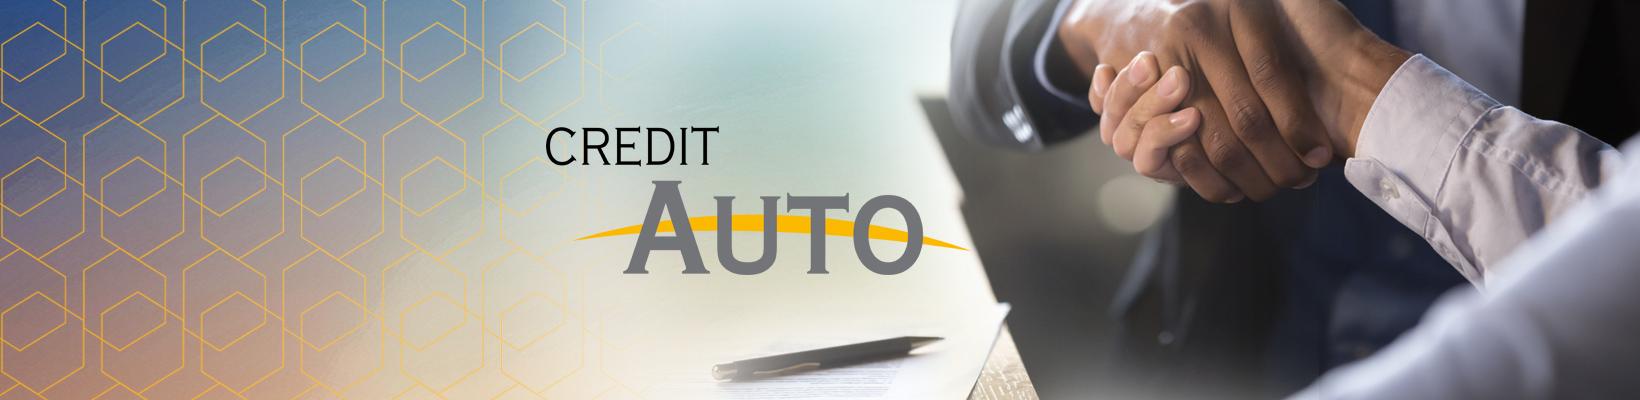 1640x400-credit-Auto